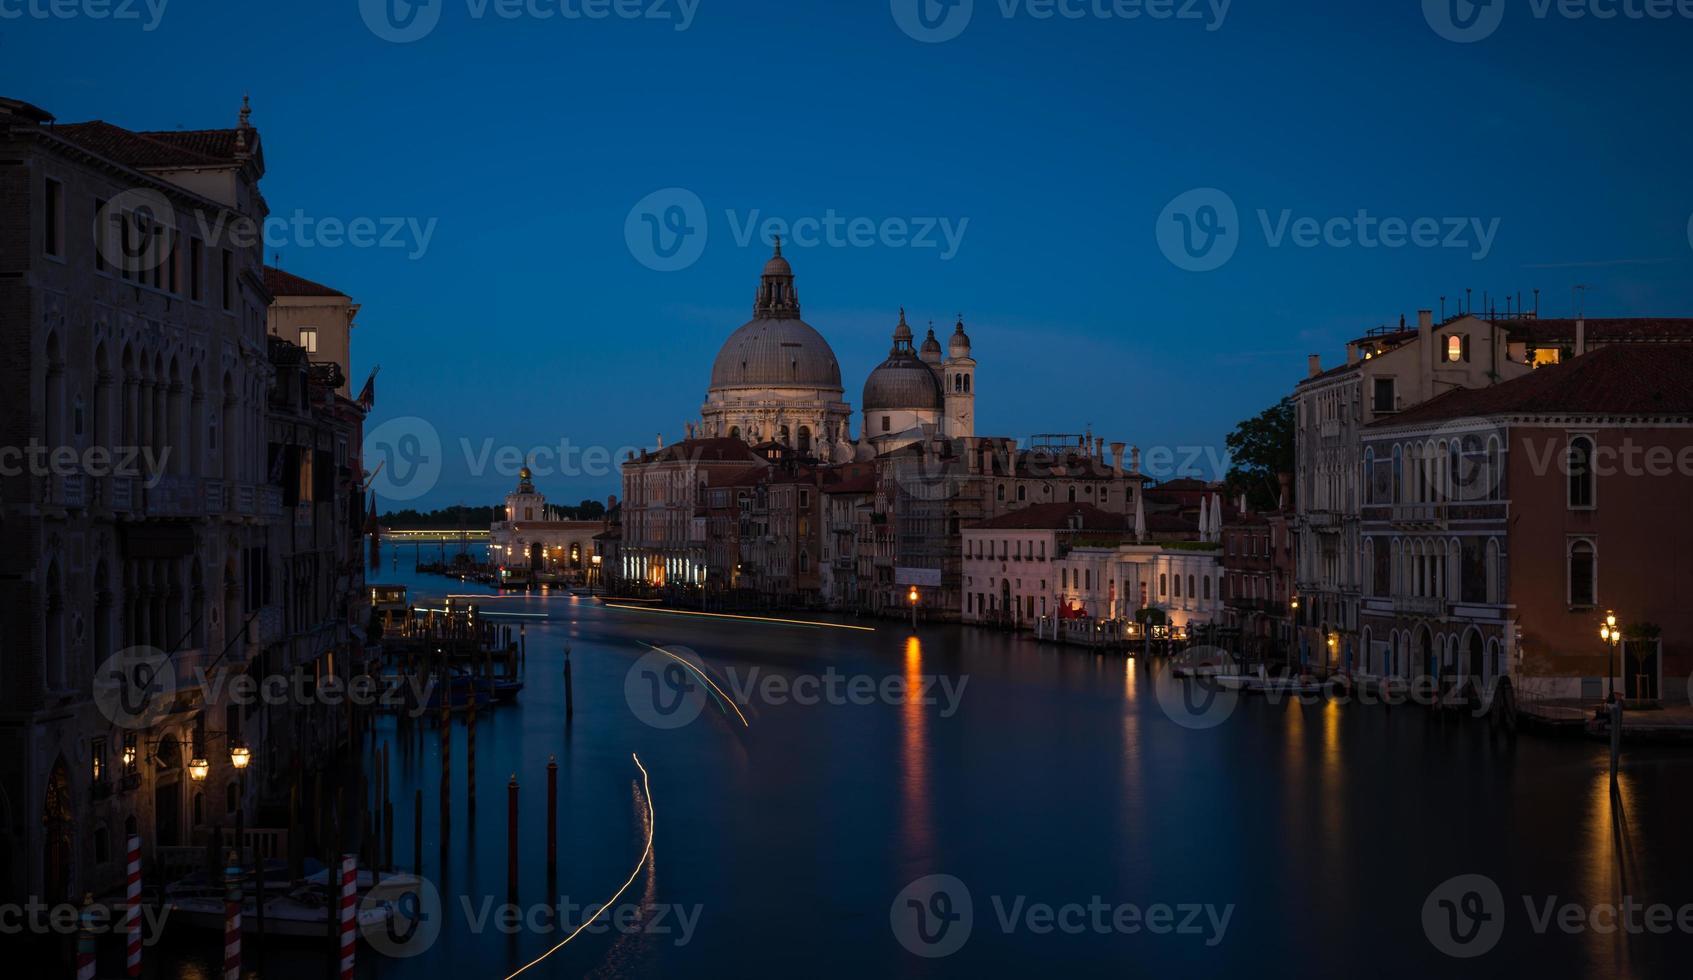 venecia nighthoot foto